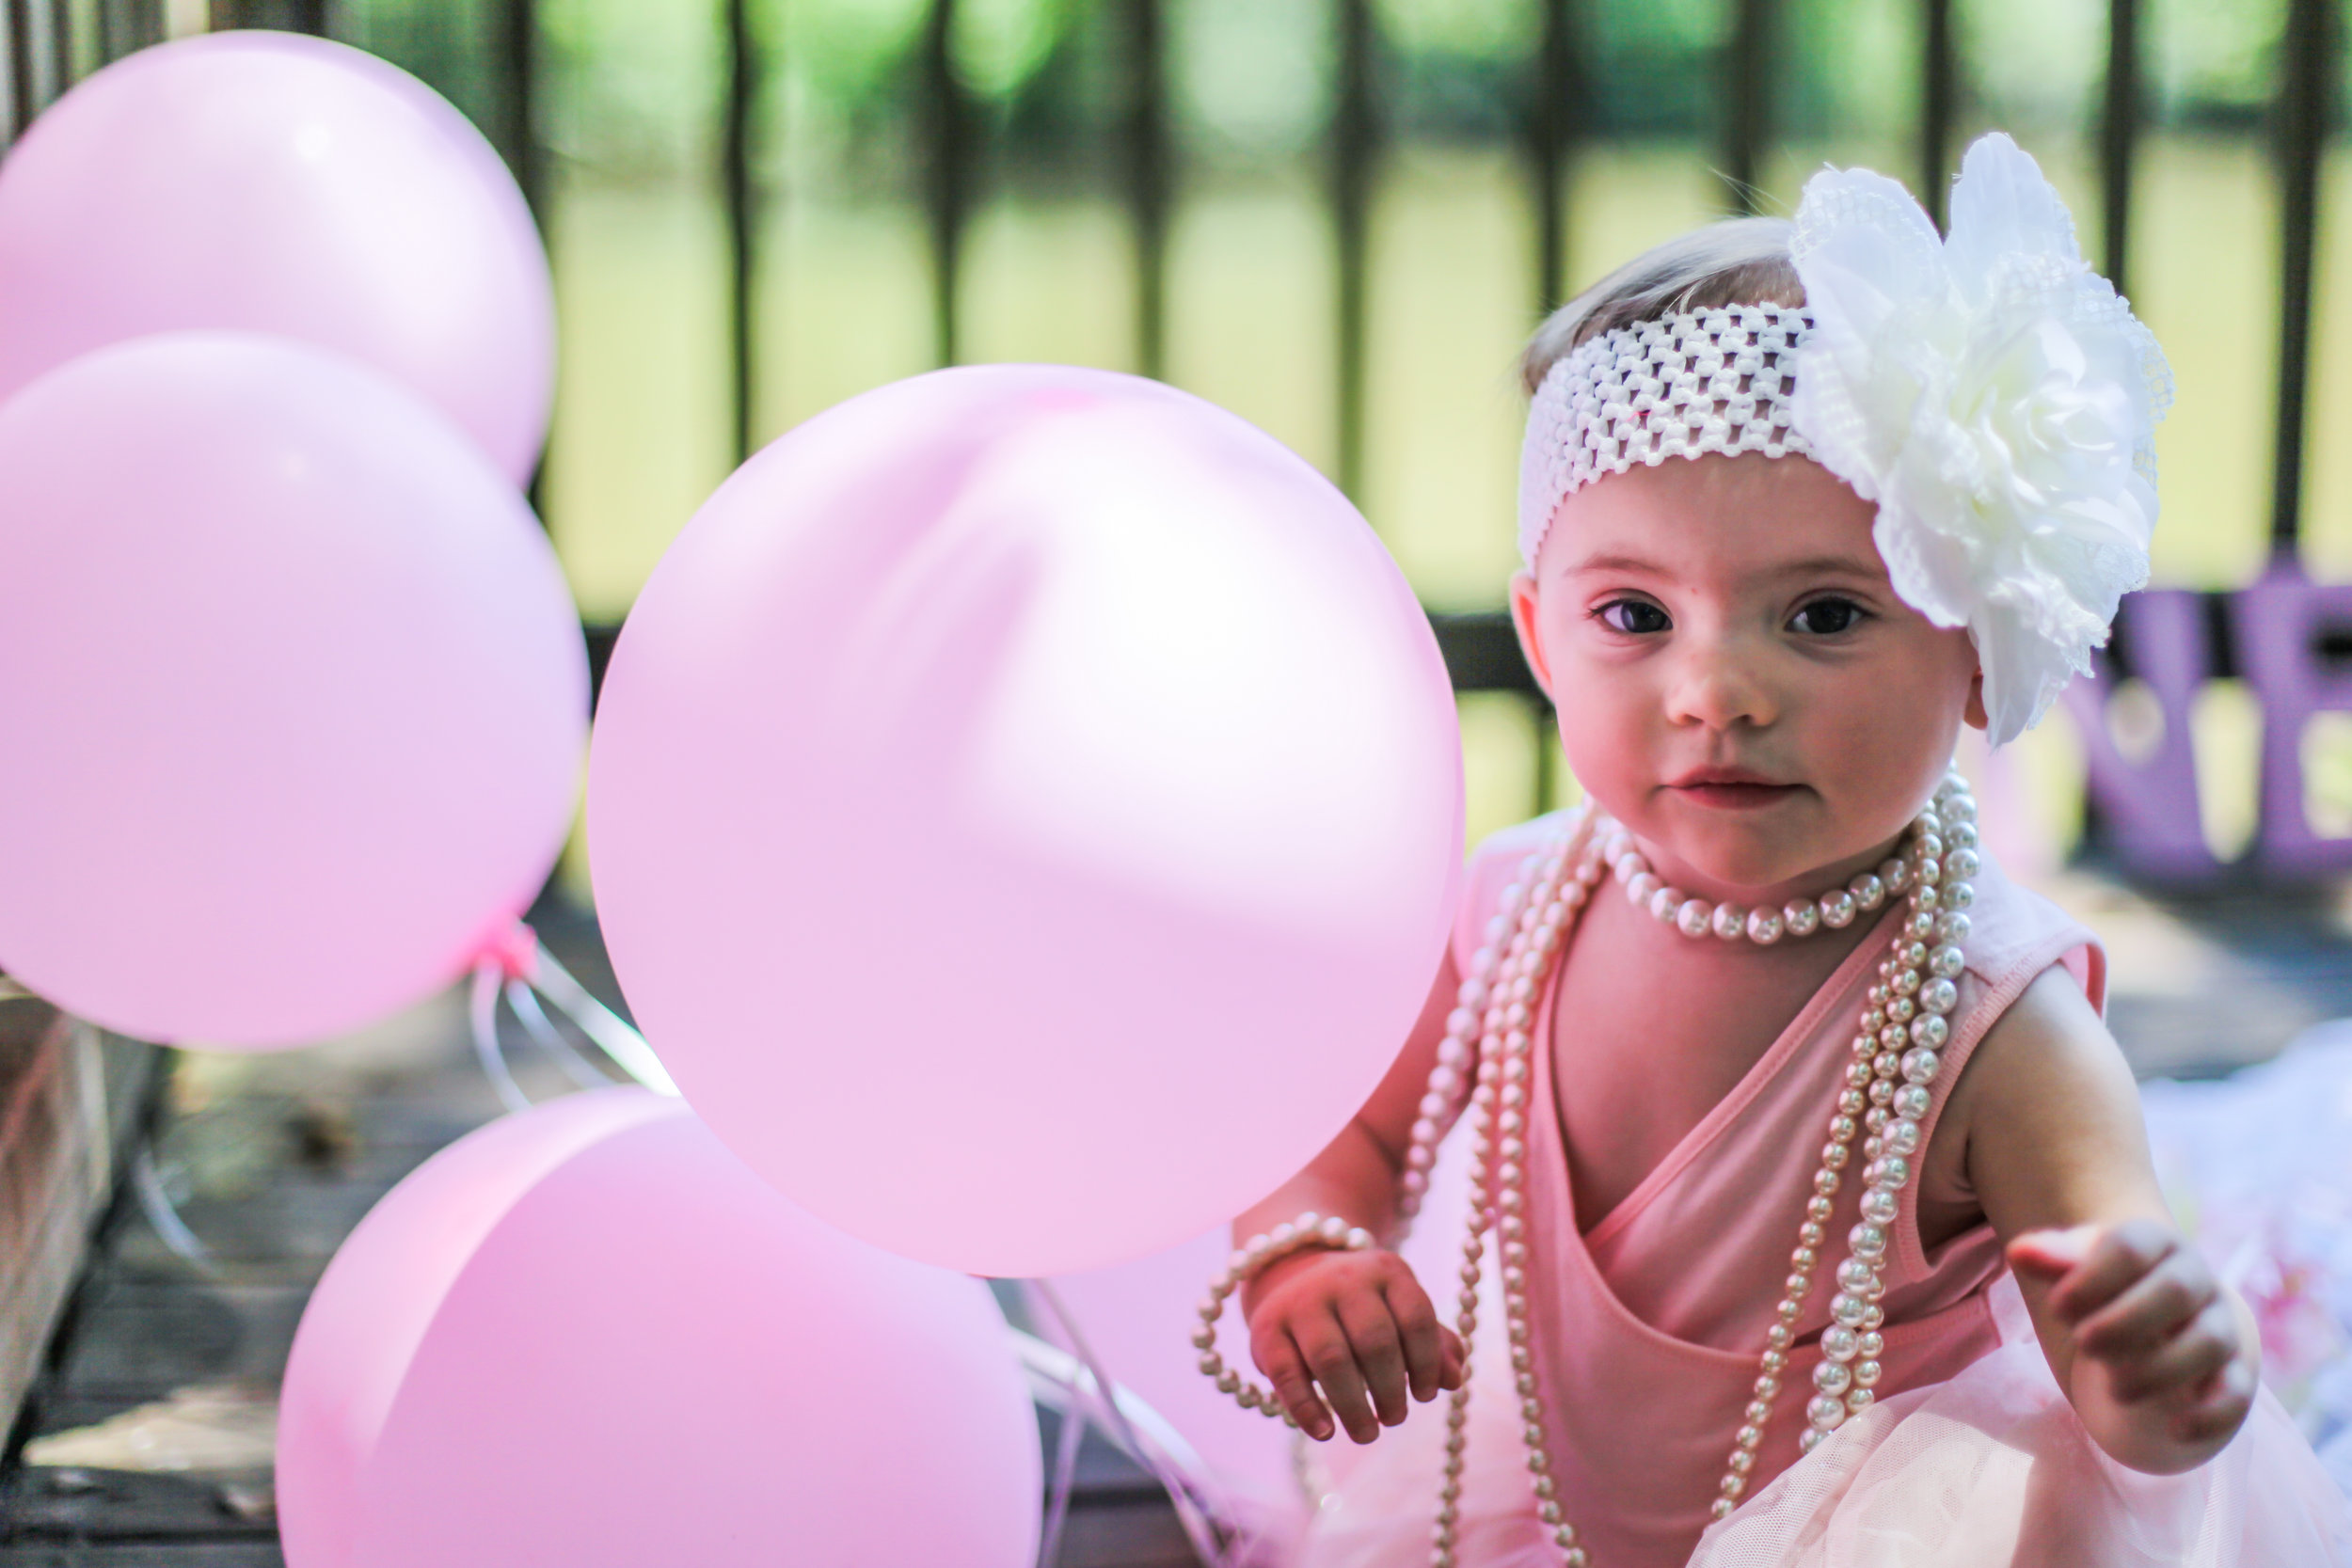 woodstock baby photography angela elliott-45.jpg